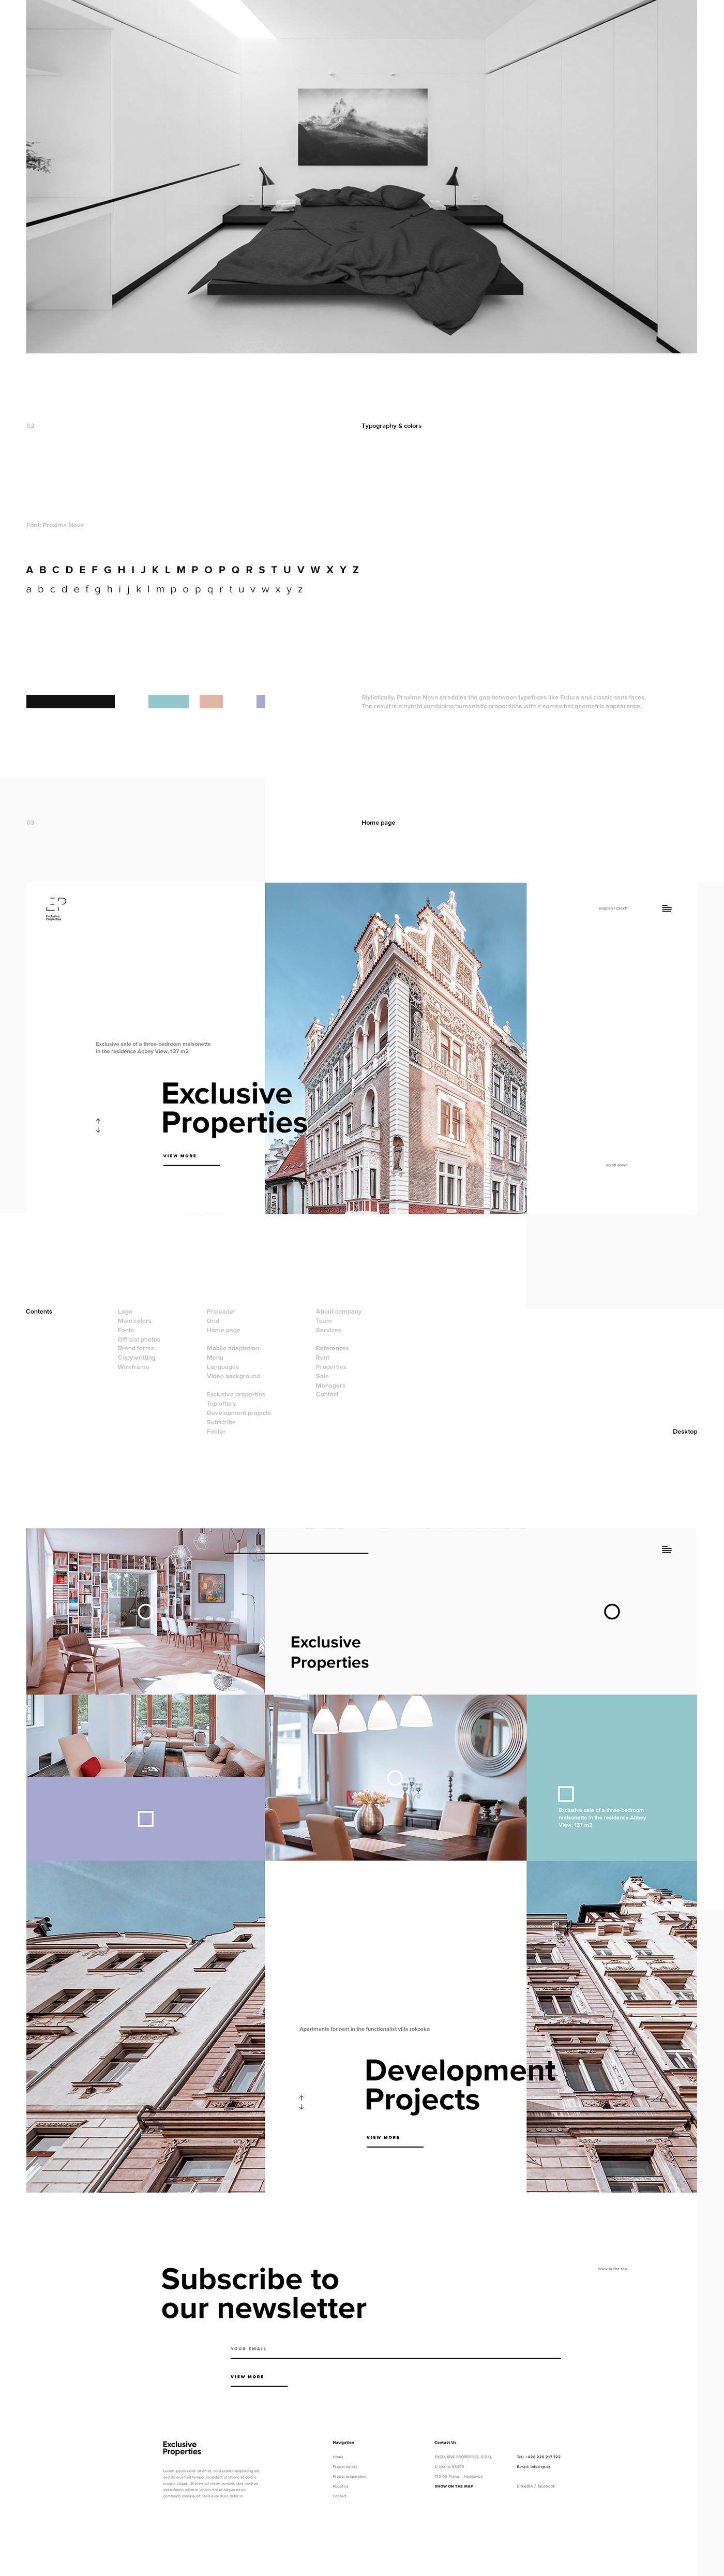 UI ux Web minimal inspire clean architecture desktop mobile White